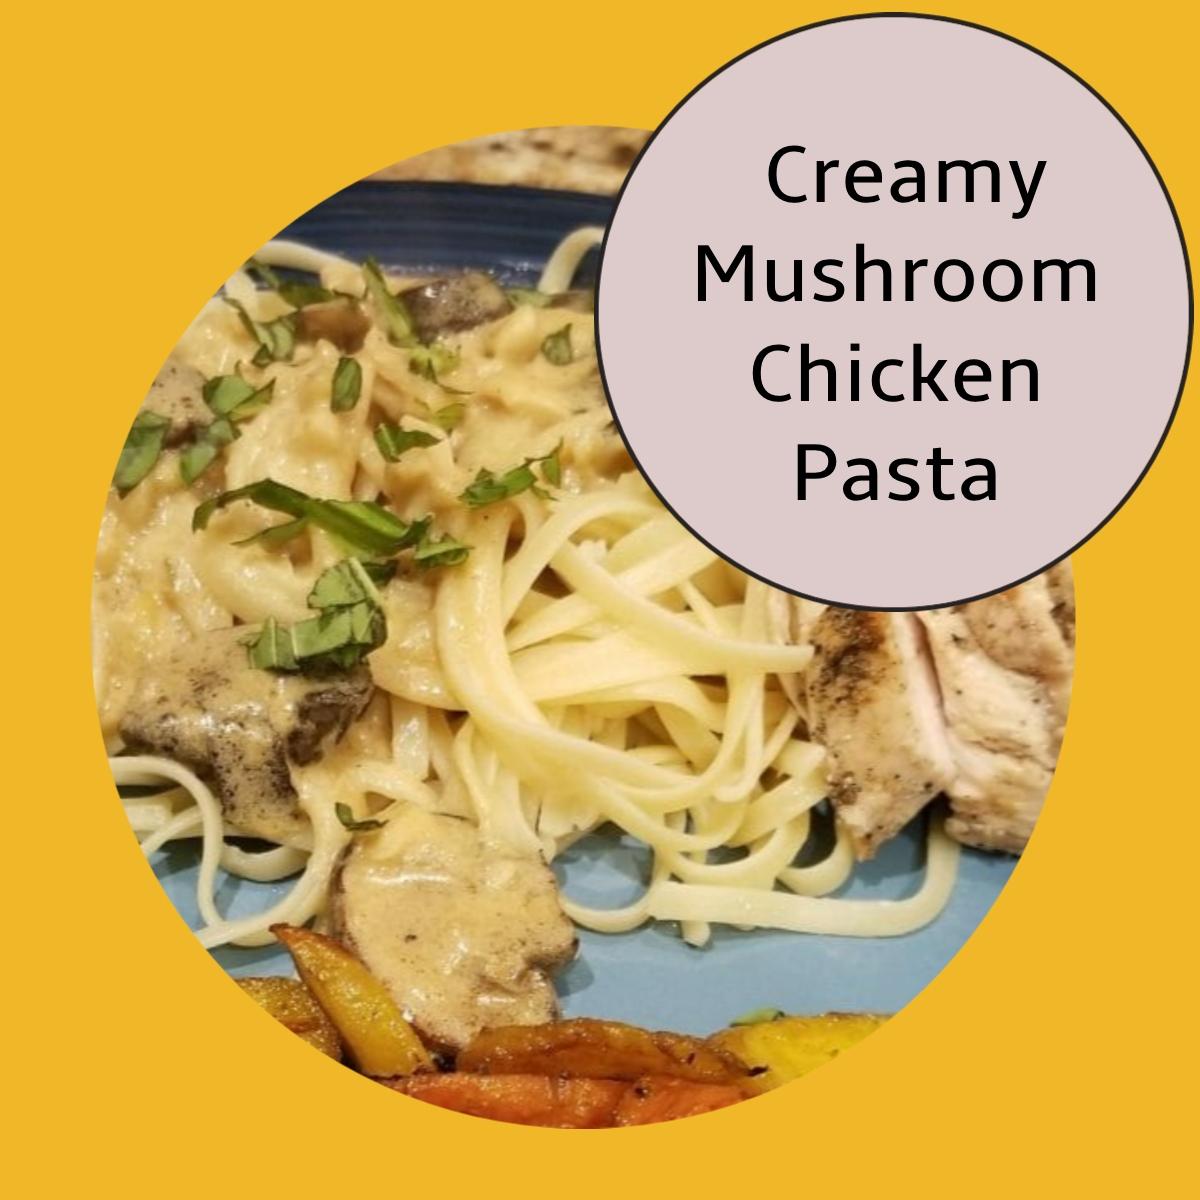 chicken and pasta dish